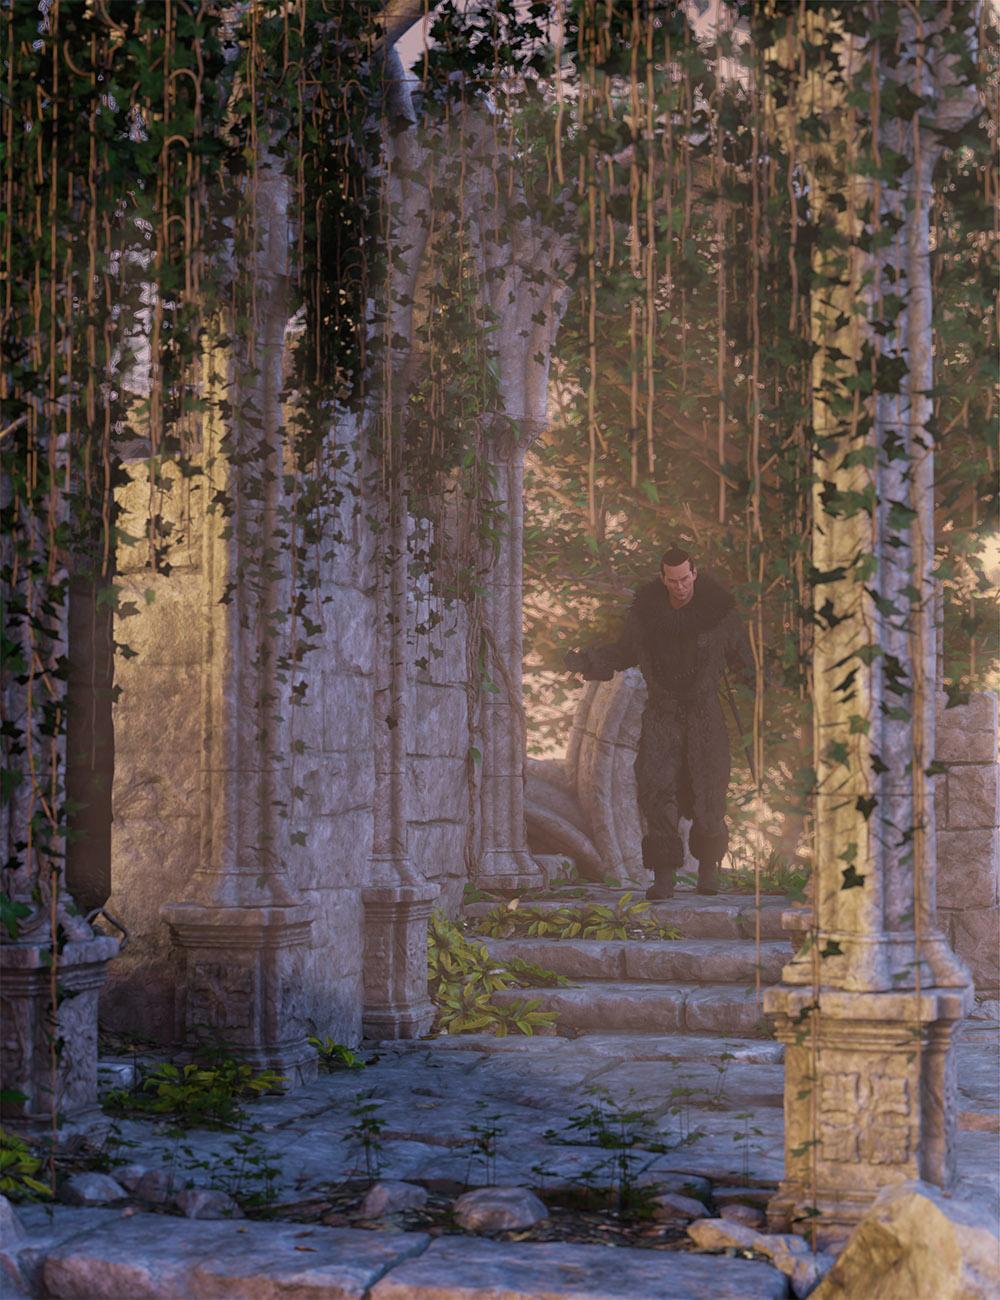 Hanging Vines -  Ivy Plants by: MartinJFrost, 3D Models by Daz 3D